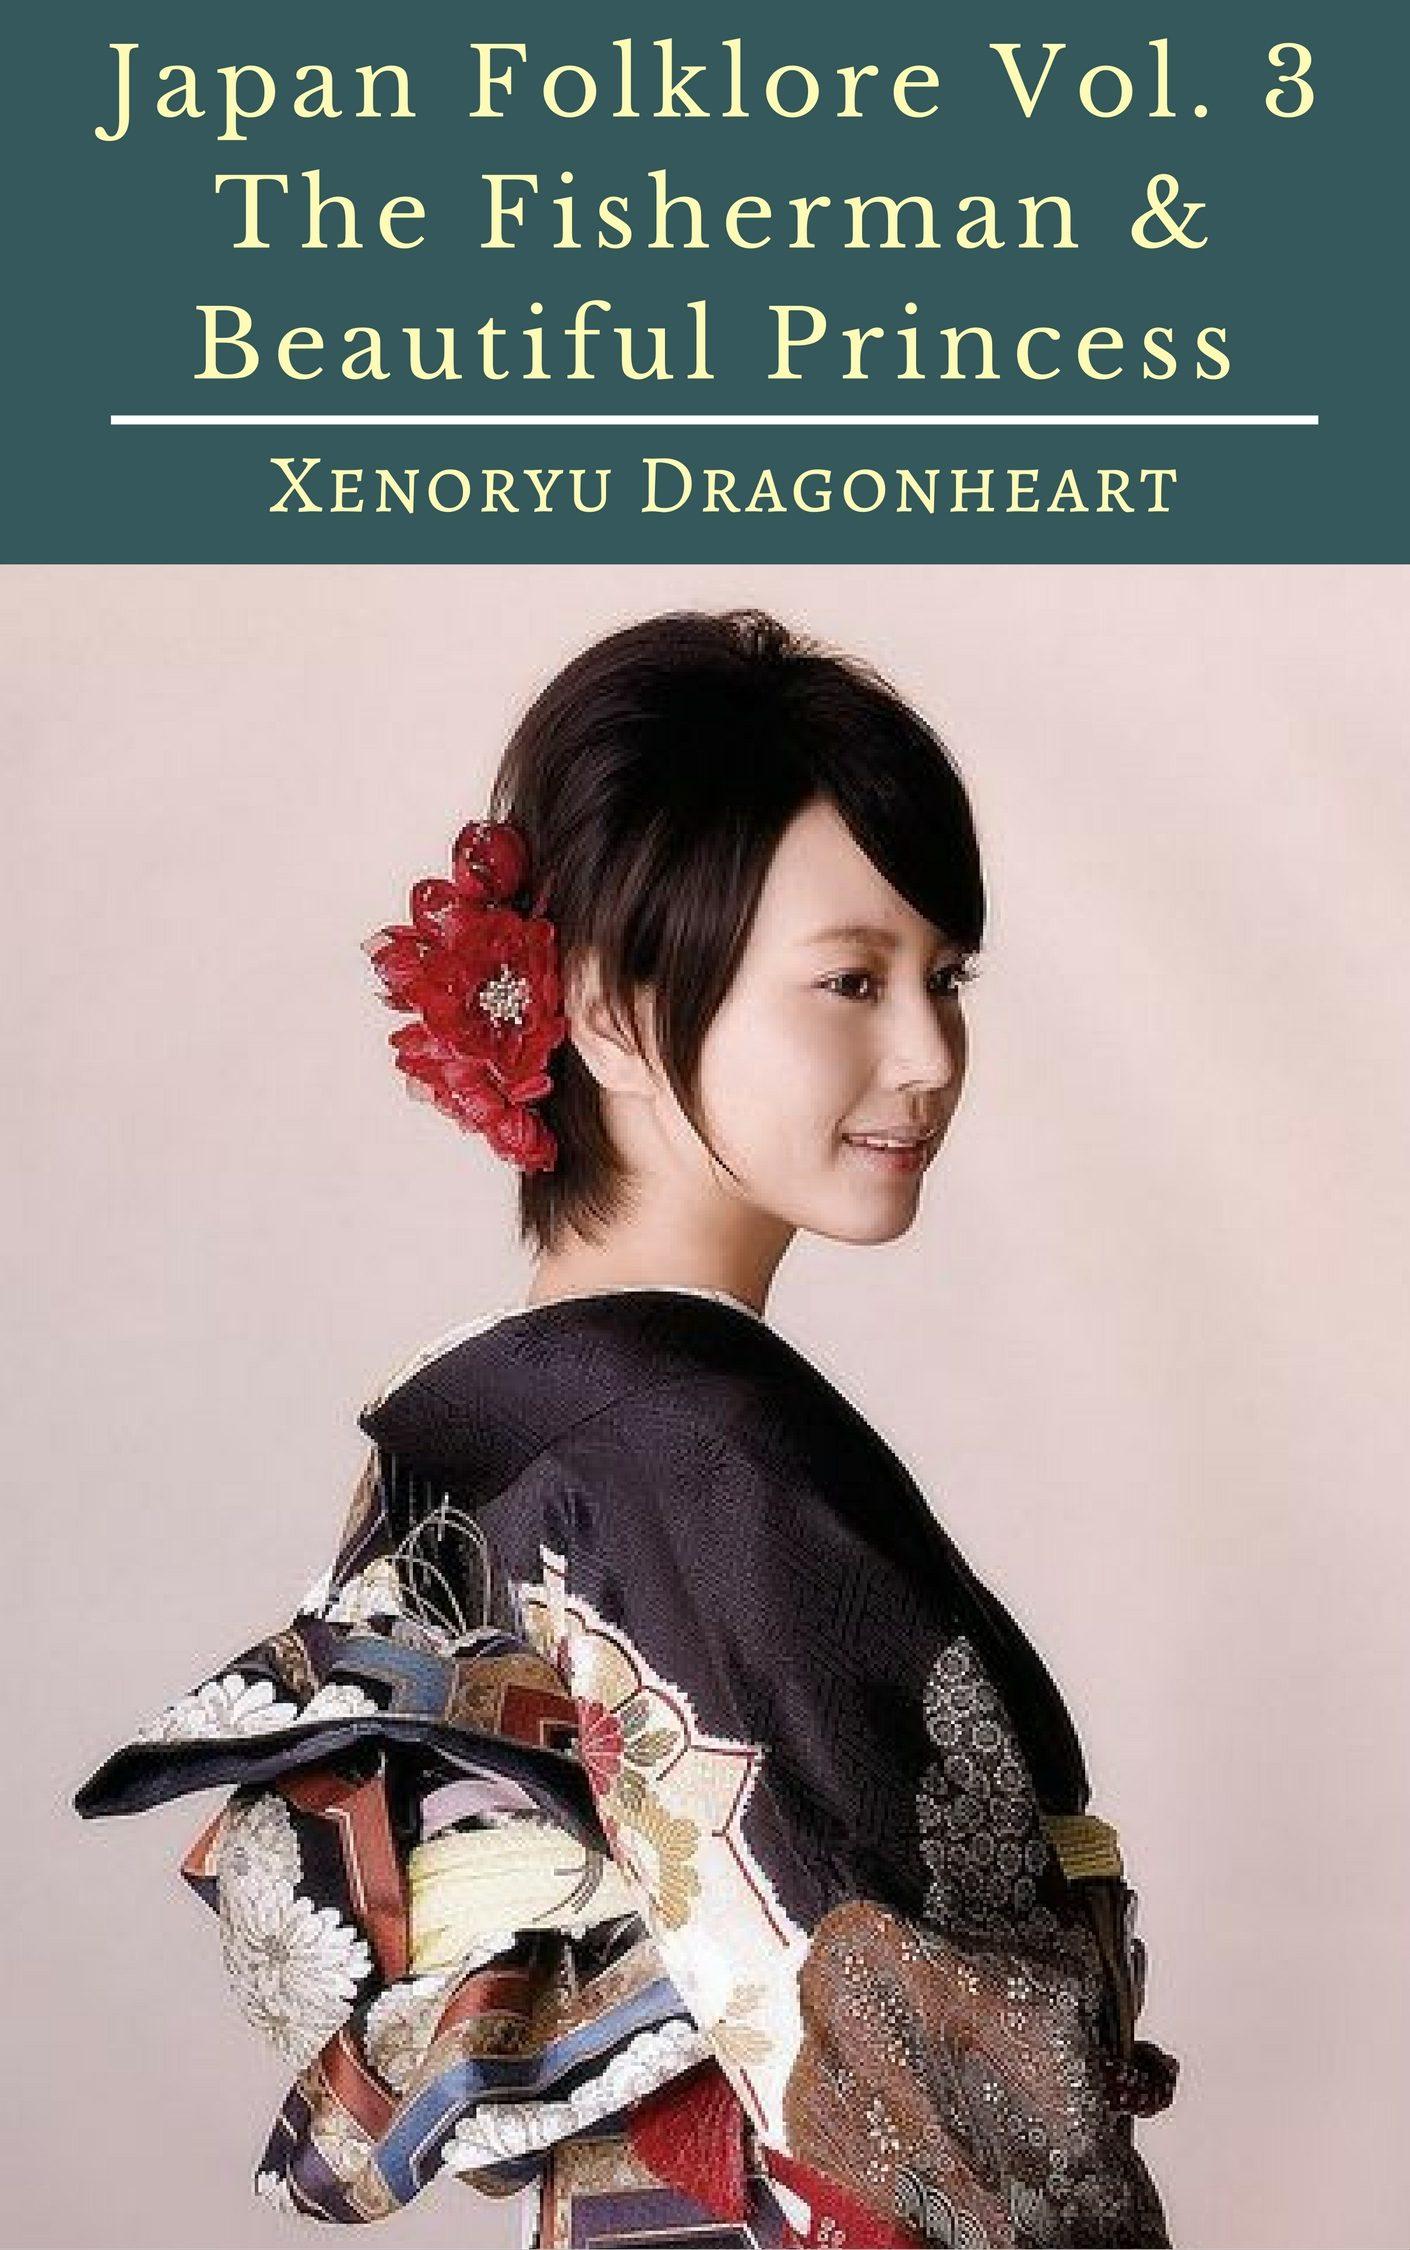 Japan Folklore Vol. 3 The Fisherman & Beautiful Princess   por  epub